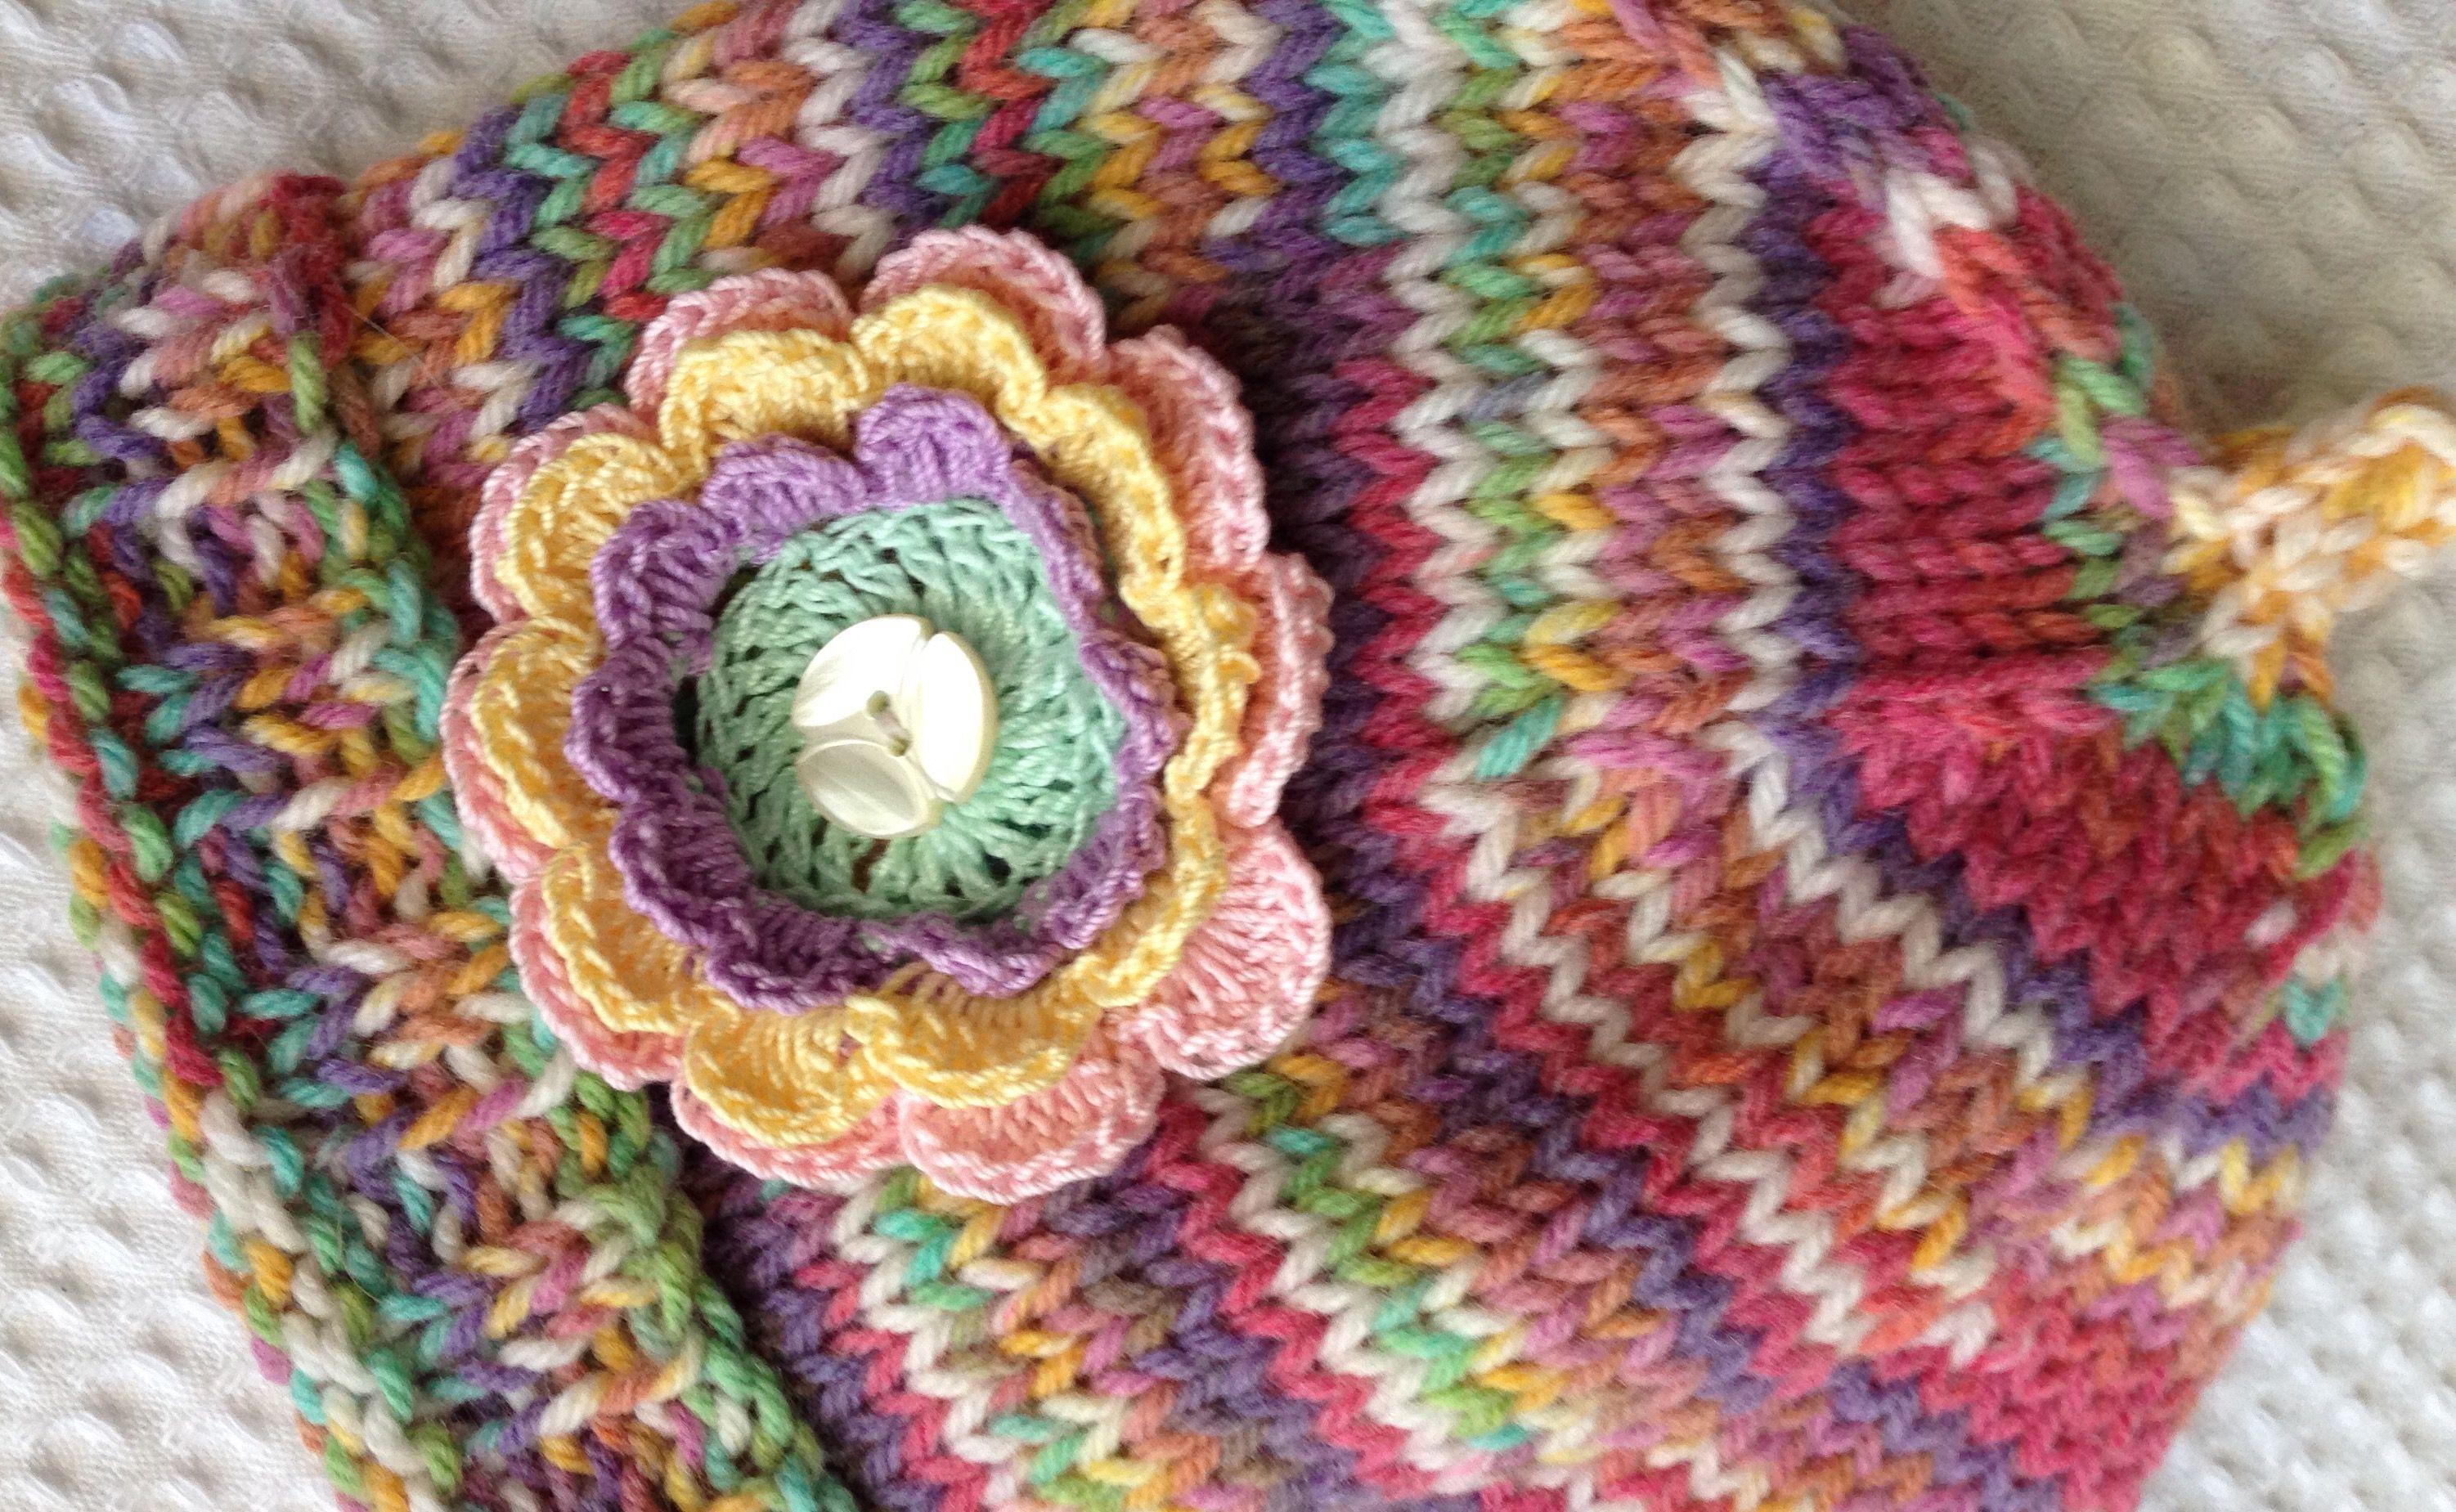 60 free crochet flower patterns one dozen easy peasy free crochet flower patterns bankloansurffo Choice Image